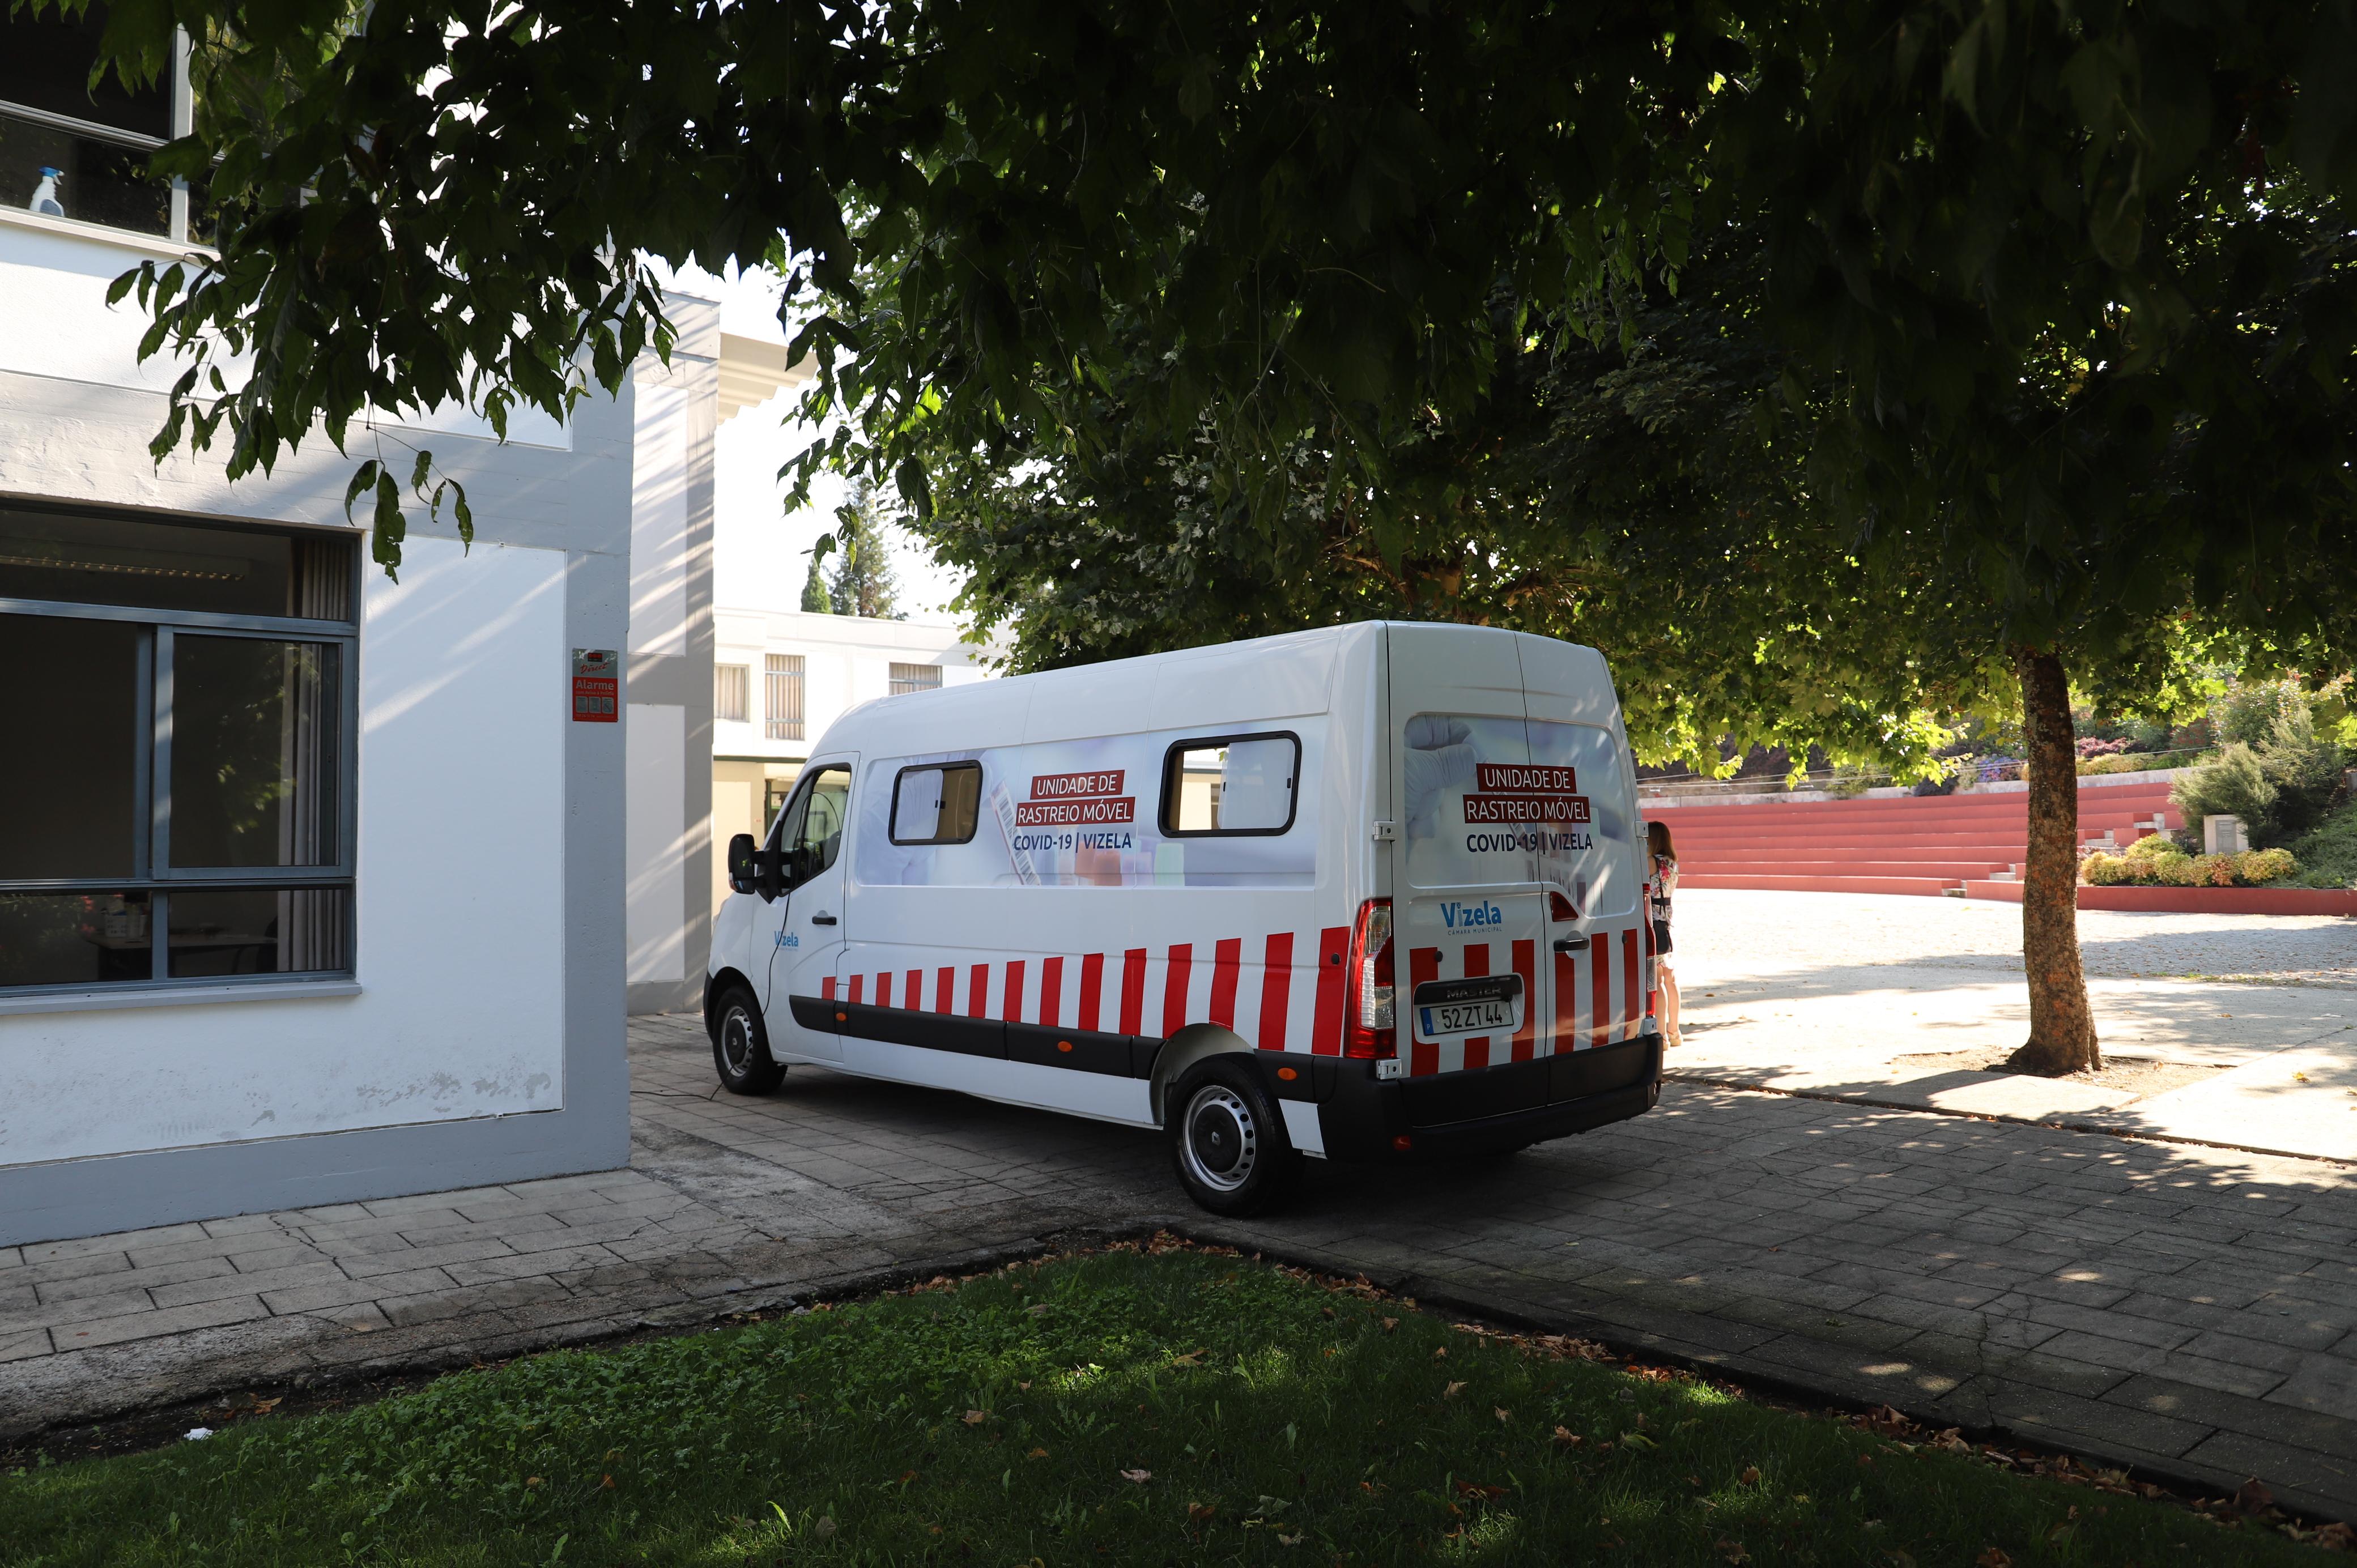 CÂMARA MUNICIPAL DE VIZELA REALIZOU TESTES COVID A ALUNOS DA ACADEMIA DE MÚSICA DA SOCIEDADE FILÁRMONICA VIZELENSE